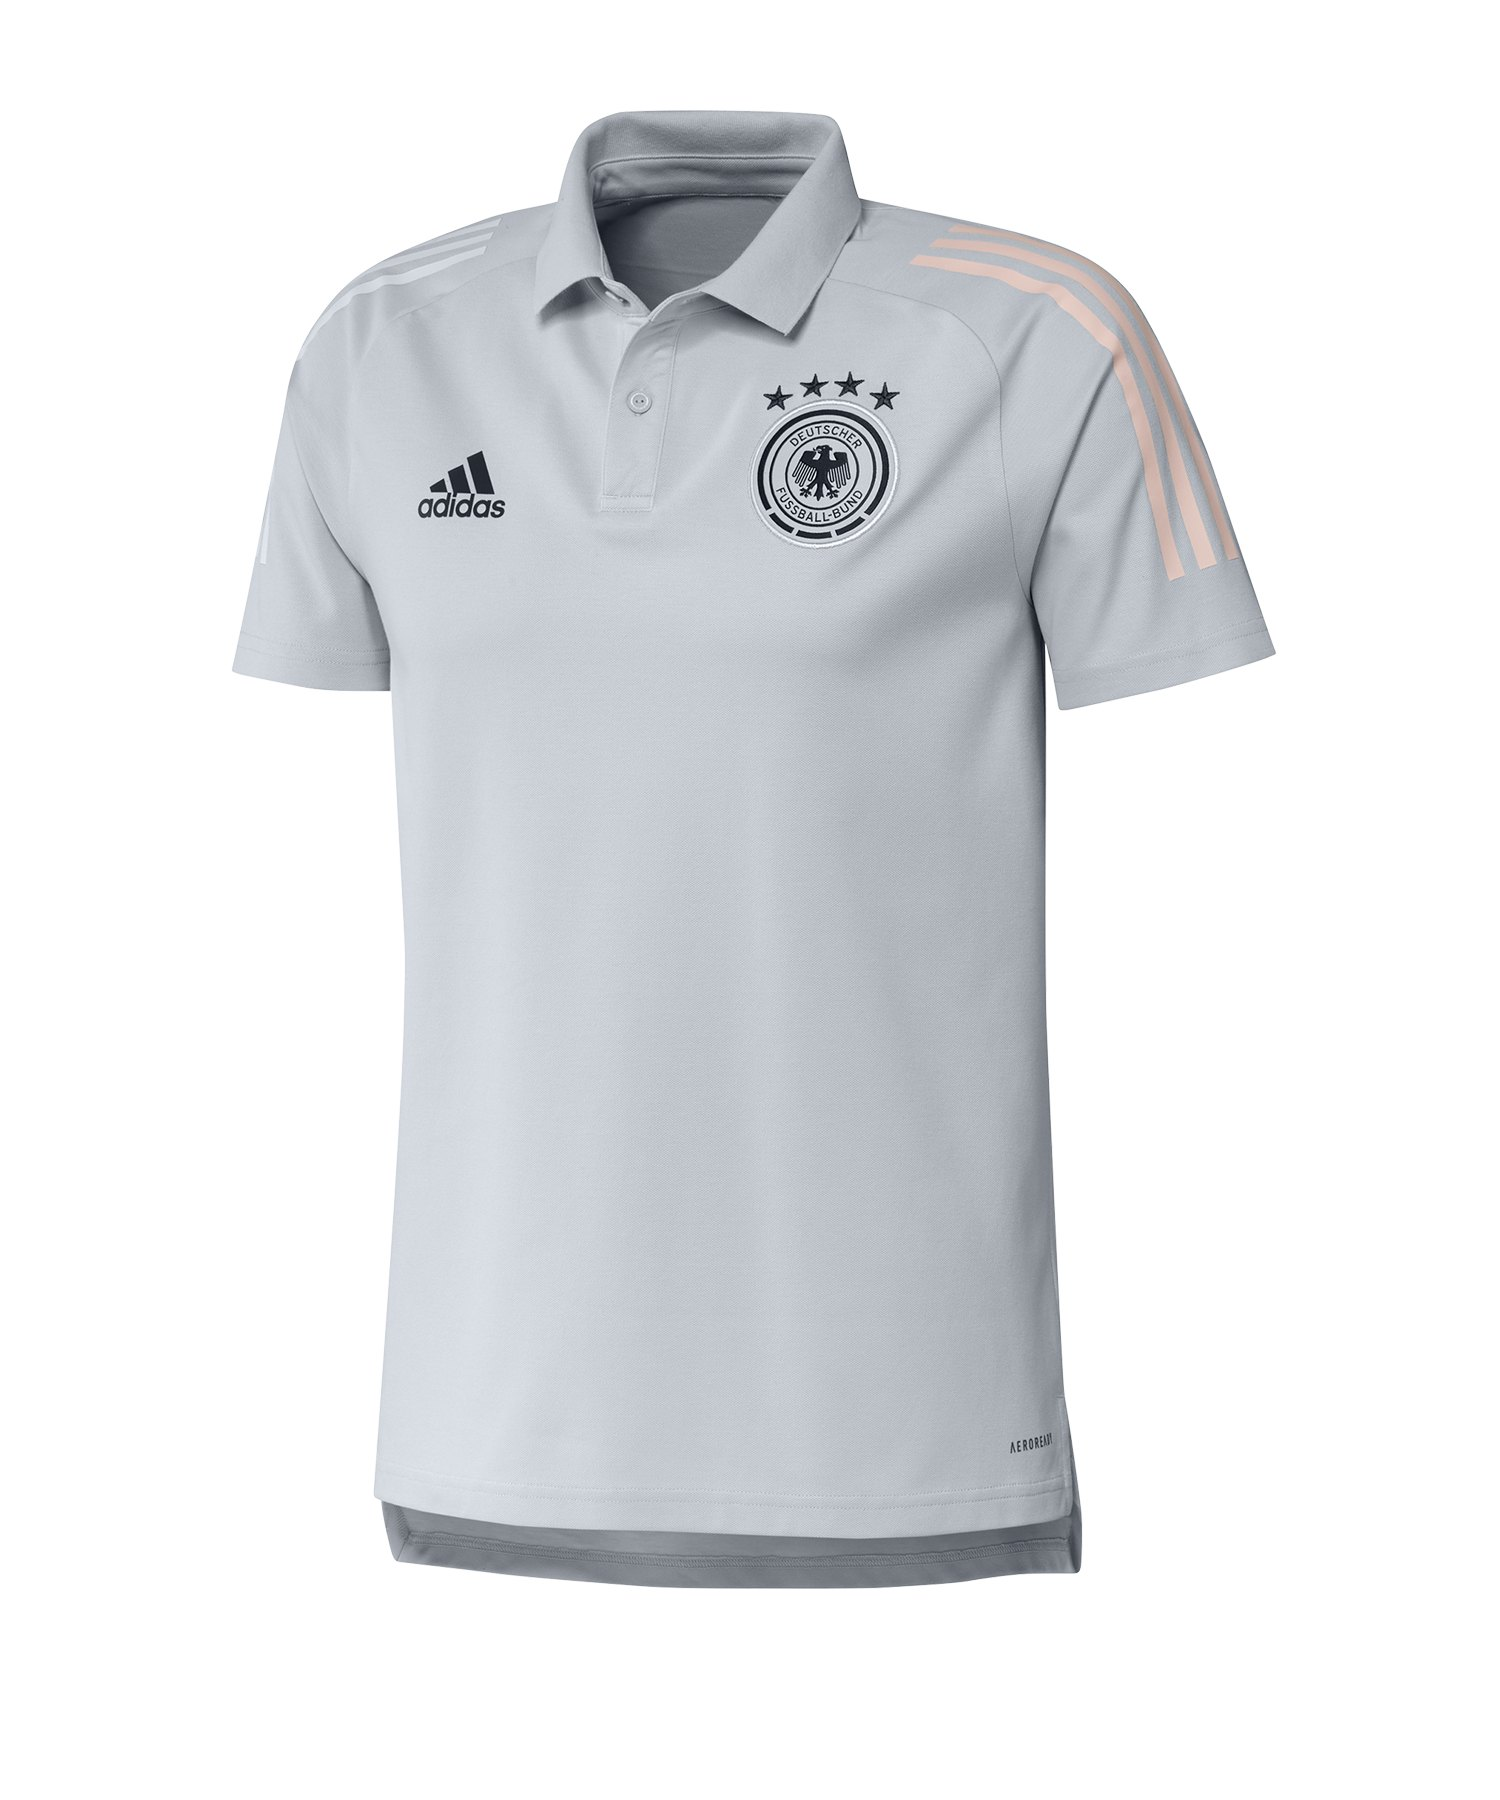 adidas DFB Deutschland Poloshirt Hellgrau - grau